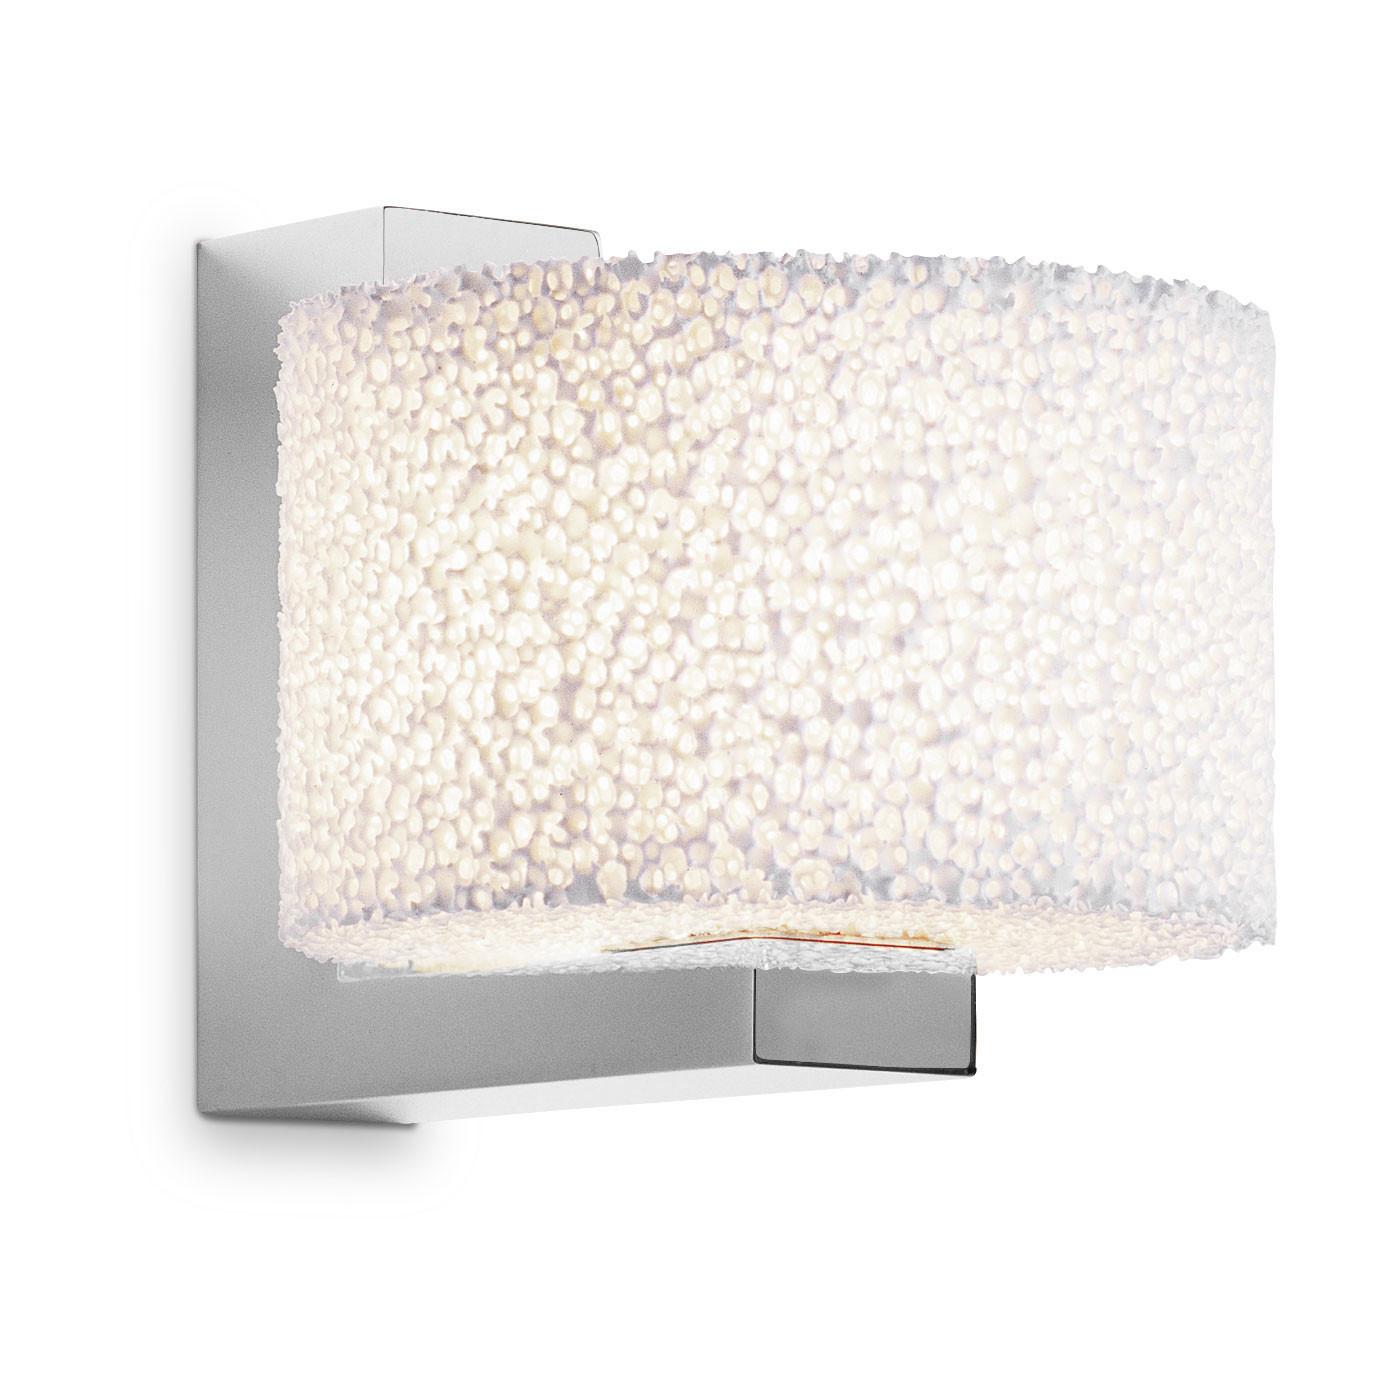 Serien Lighting Reef Wall